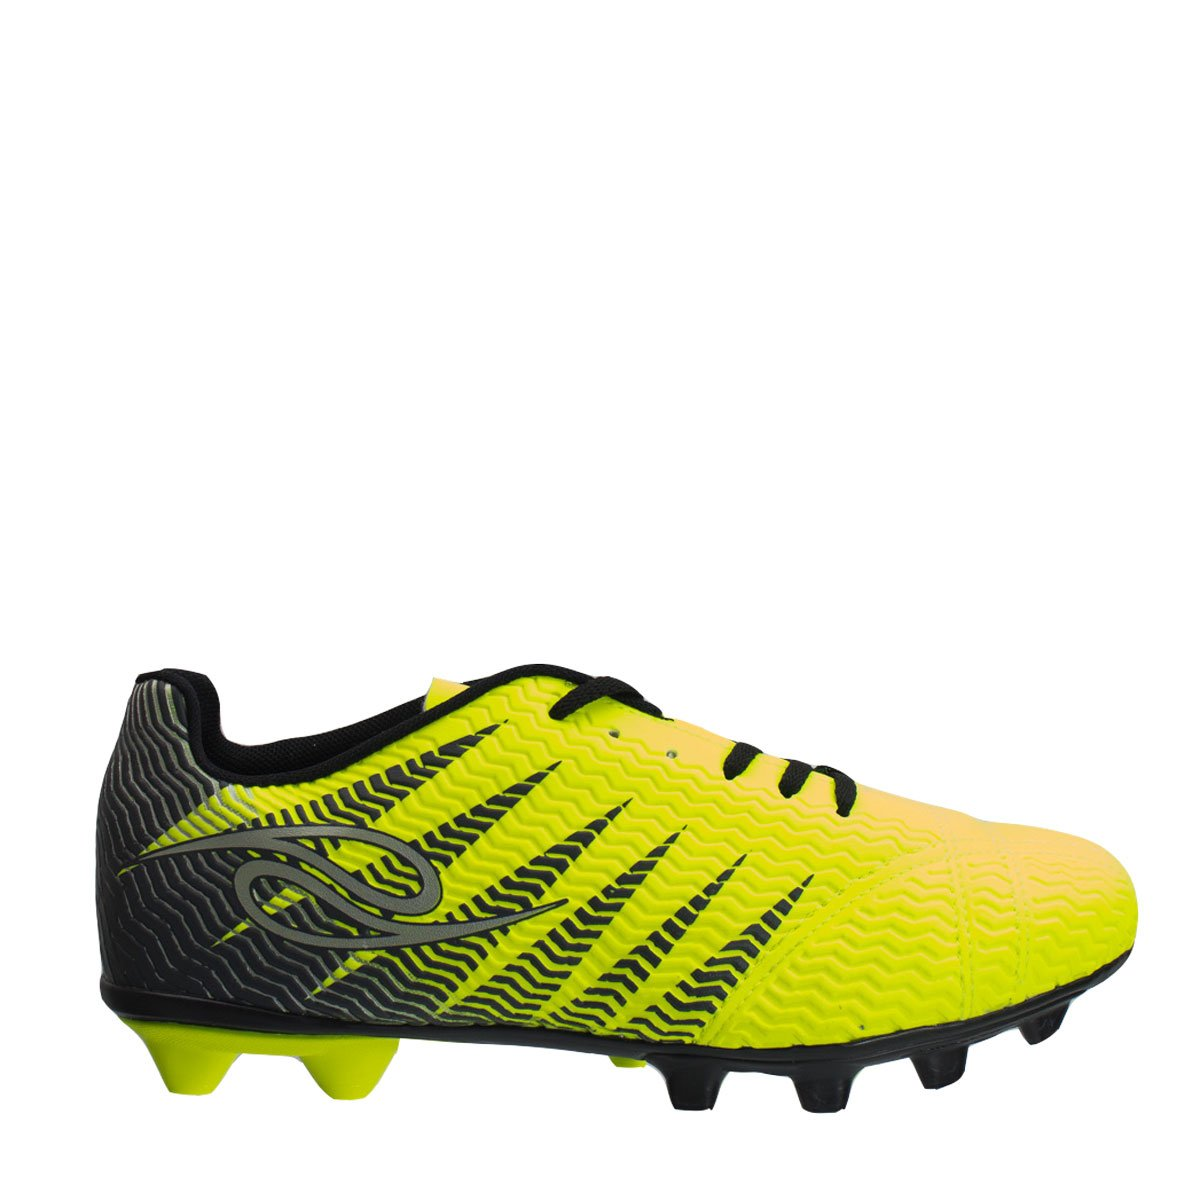 Bizz Store - Chuteira Futebol de Campo Masculina Dalponte Wembley f55db9b3f43fe